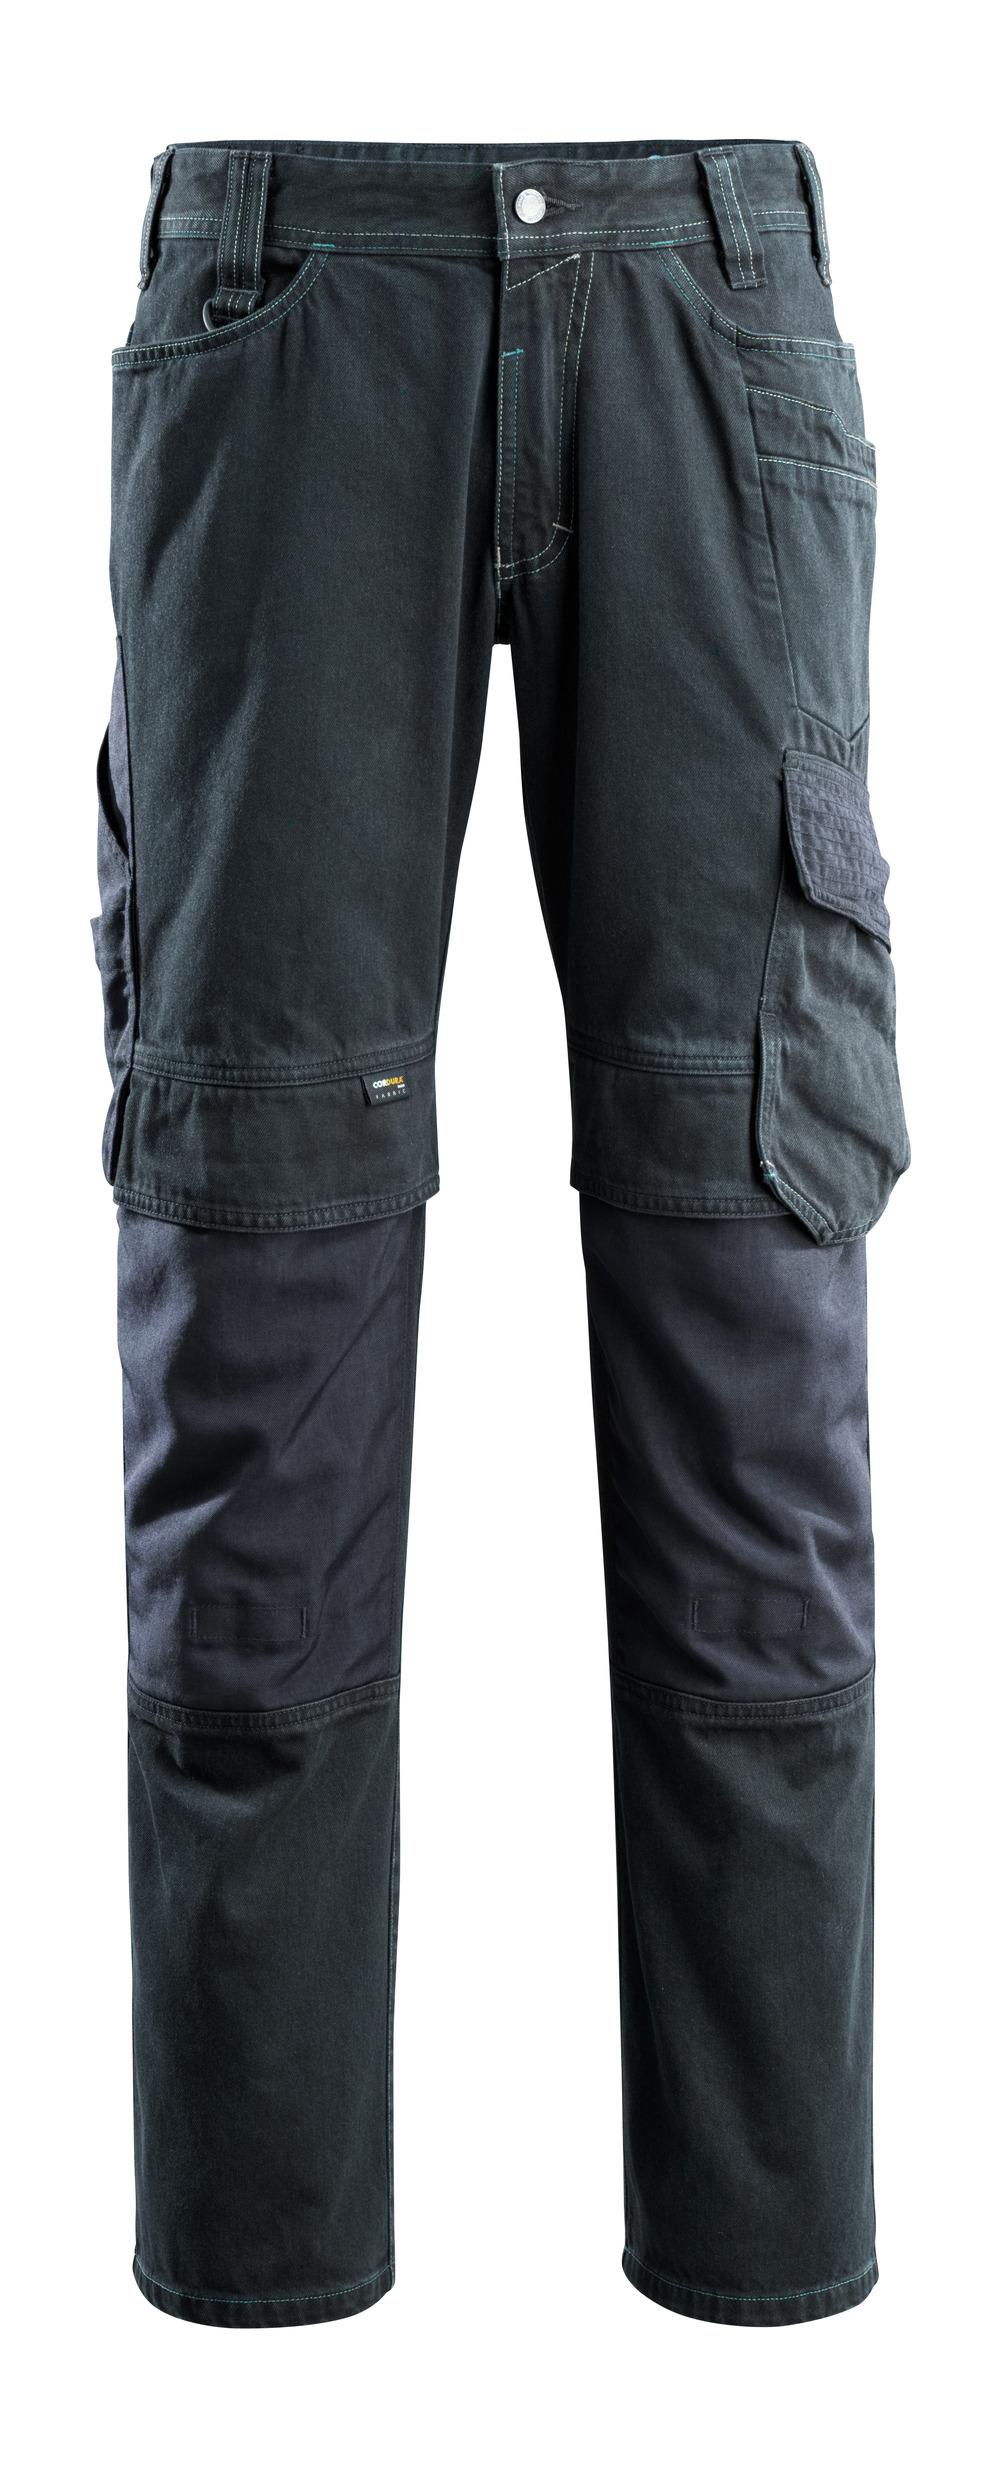 15179-207-86 Jeans med knælommer - mørkeblå denim